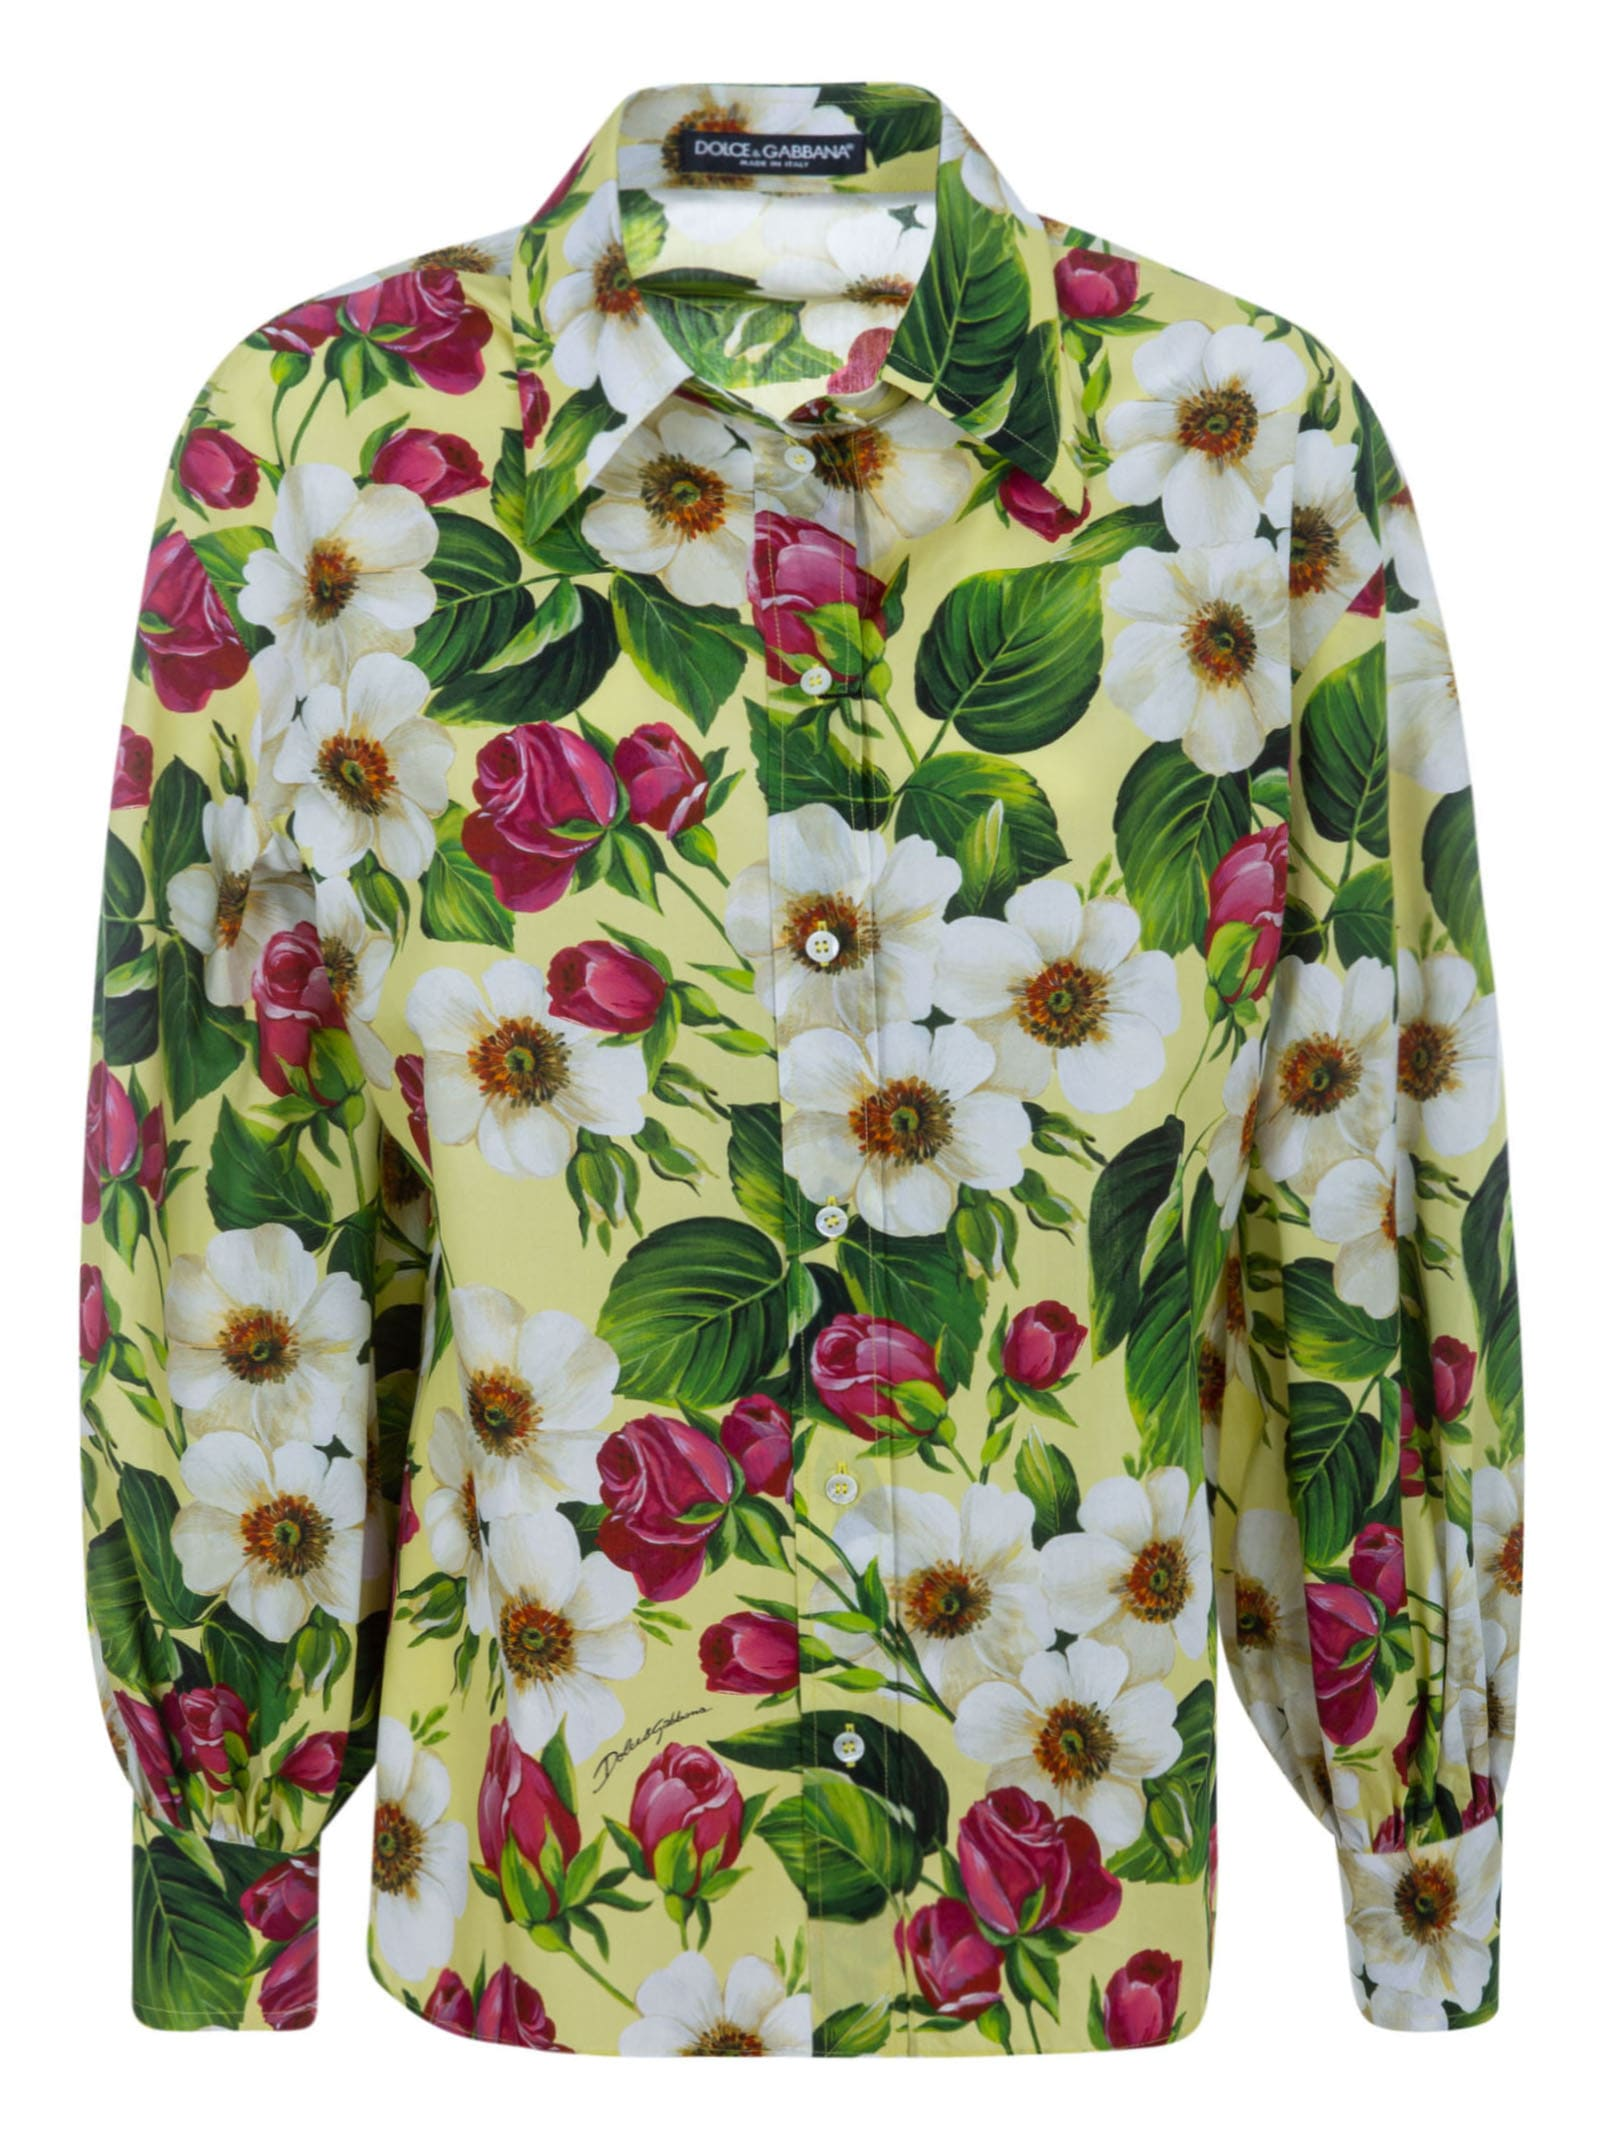 Dolce & Gabbana All-over Floral Print Shirt